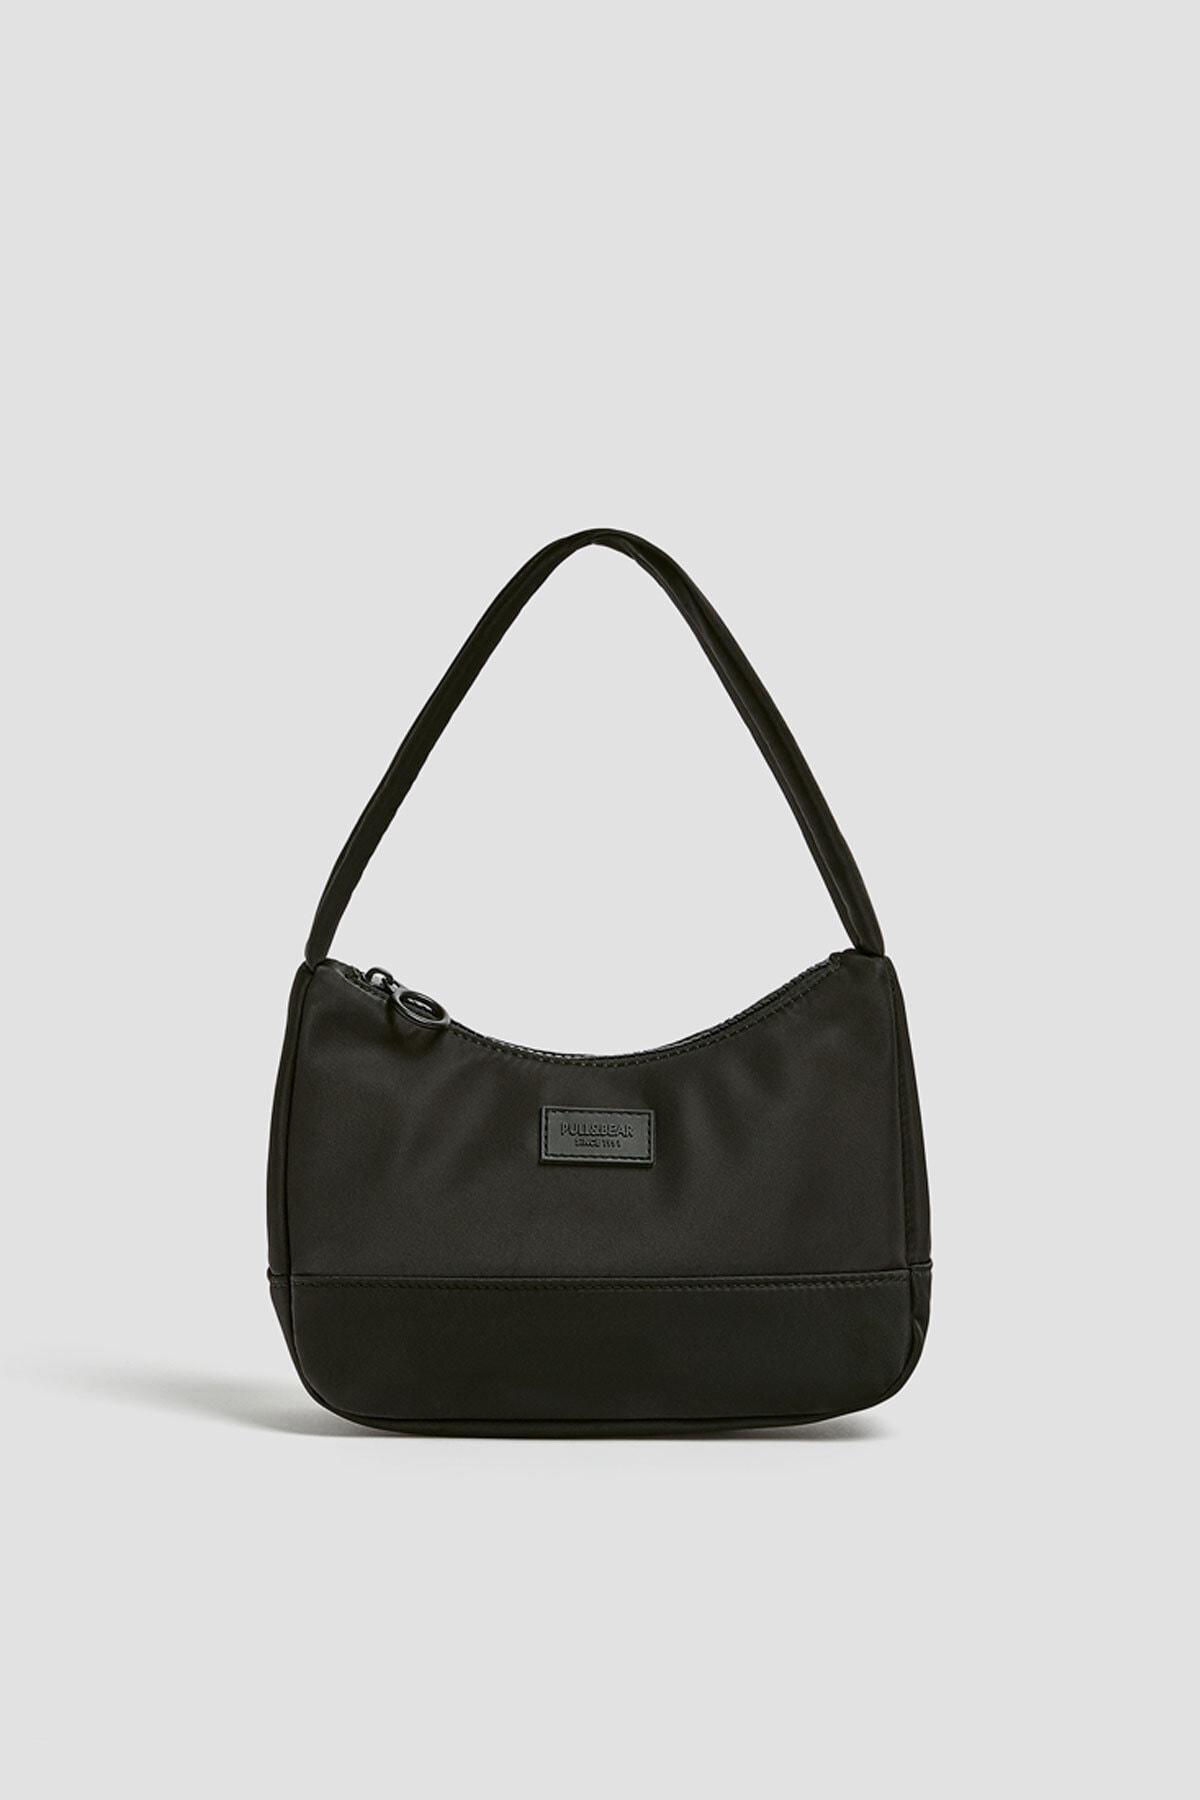 Pull & Bear Kadın Siyah Mini Baget Çanta 14019640